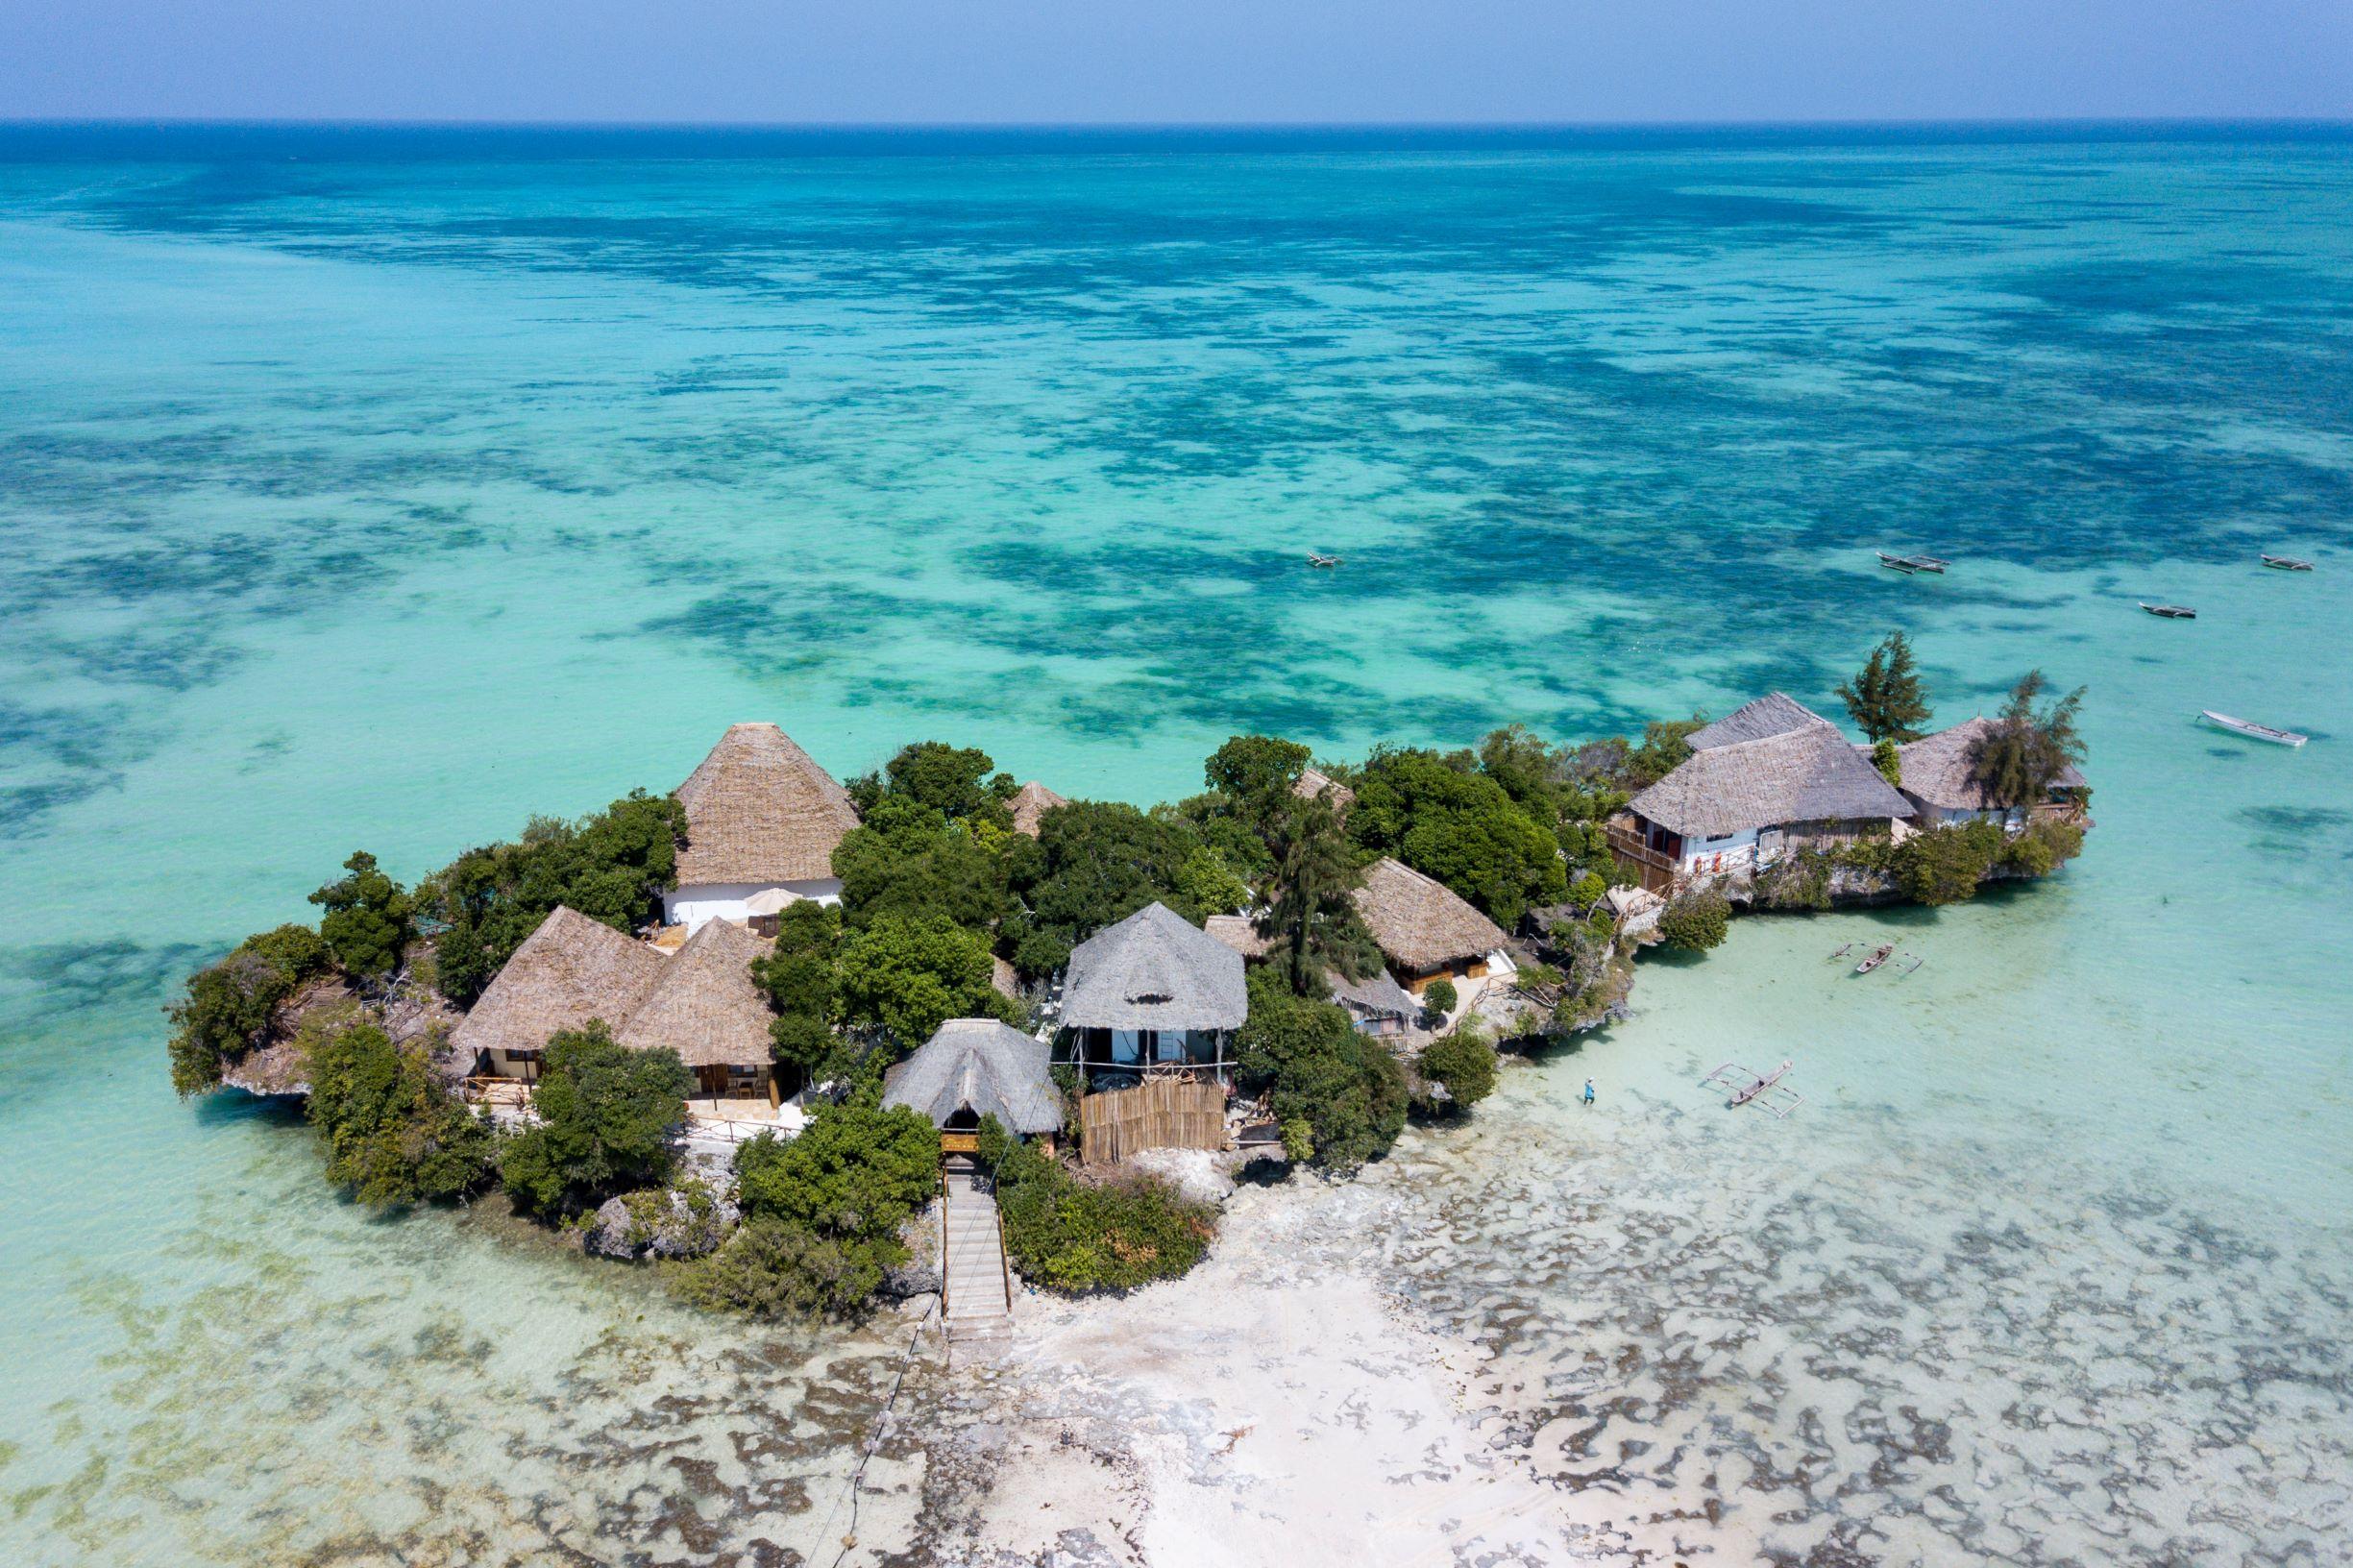 The Island Pongwe